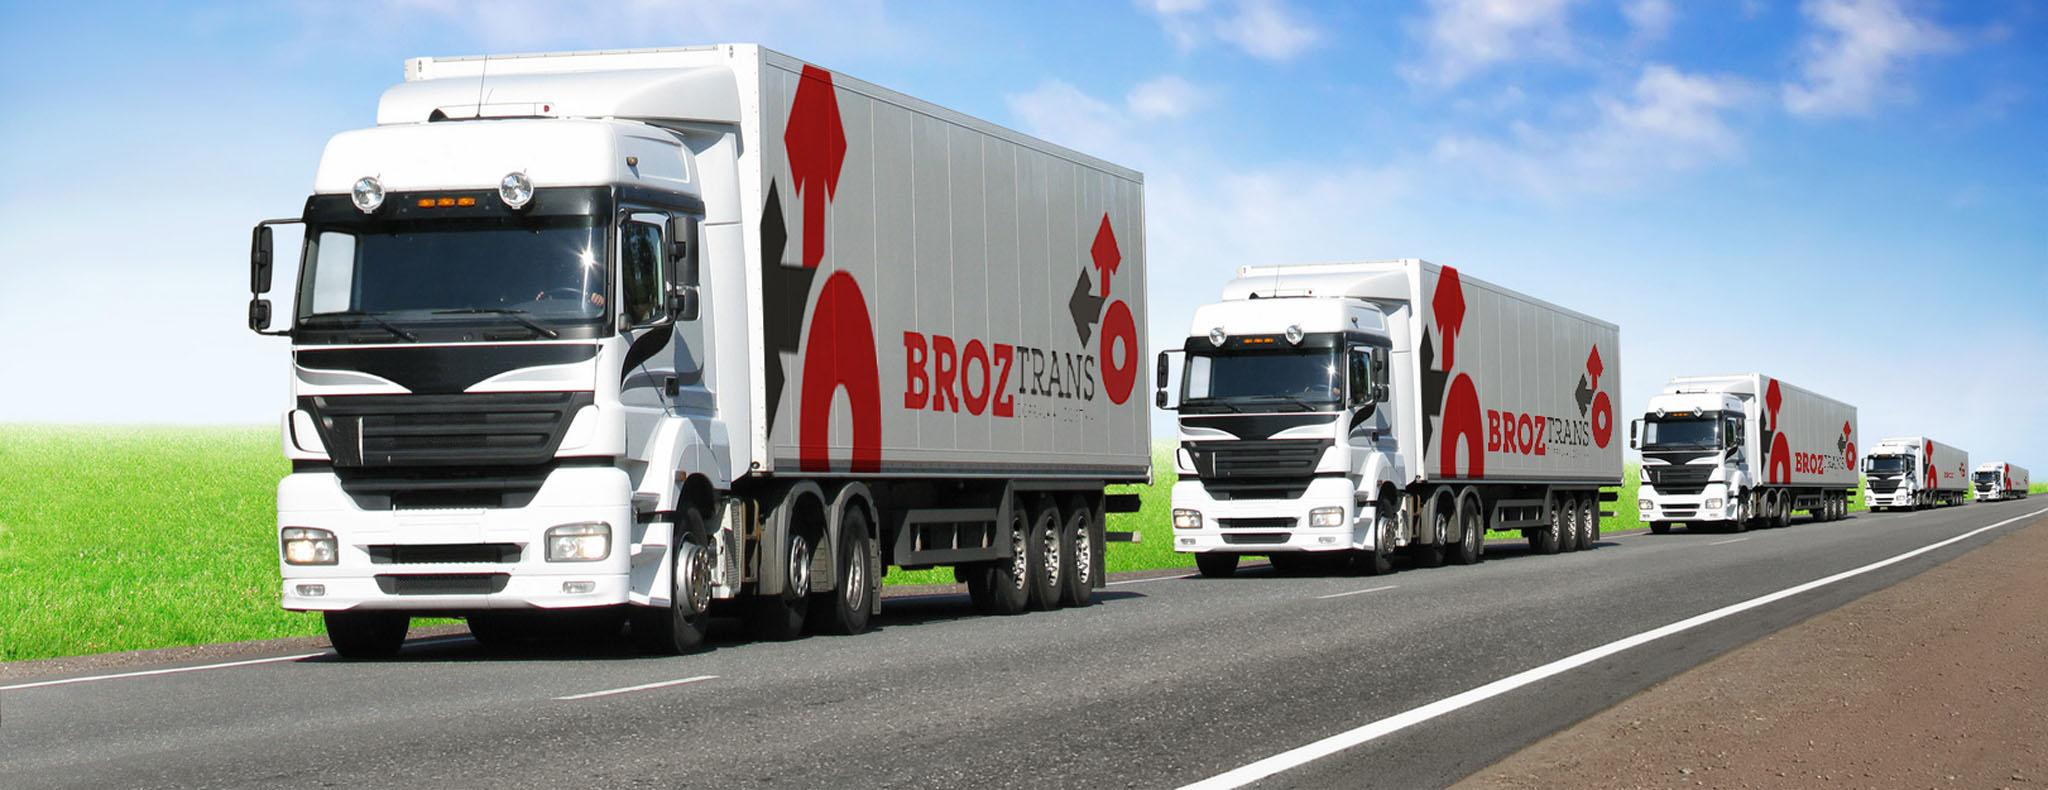 BROZTRANS - Kontakty